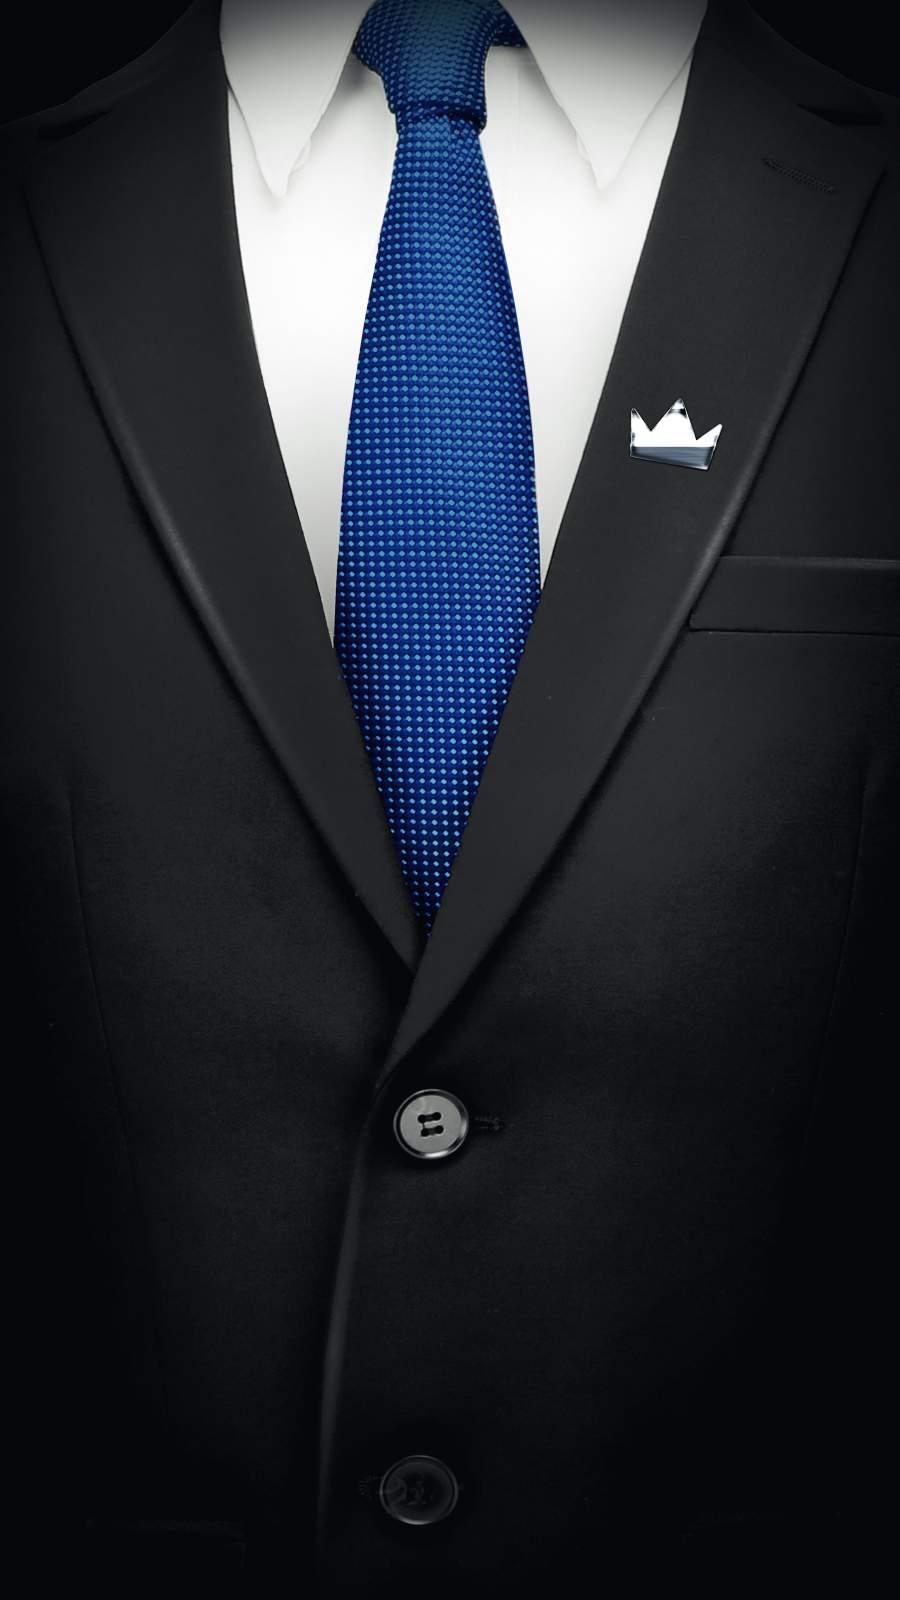 Kingsman iPhone Wallpaper